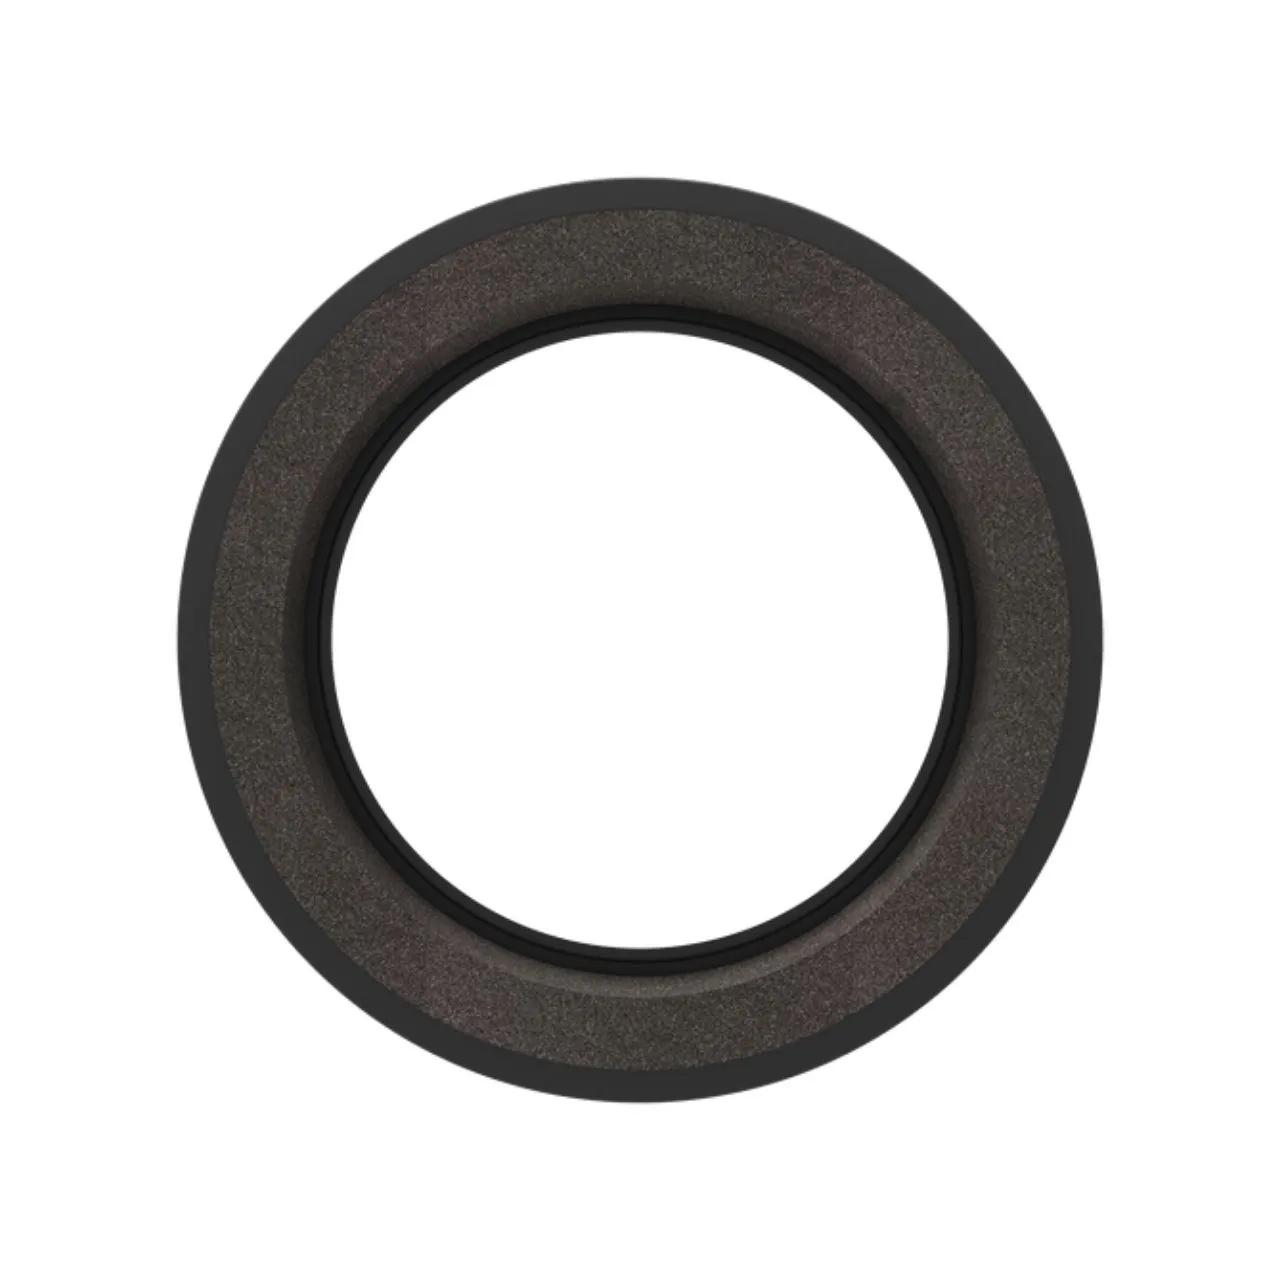 Anel Abafador 13 Pol Muffl Control Ring Mf-1013-00 Remo